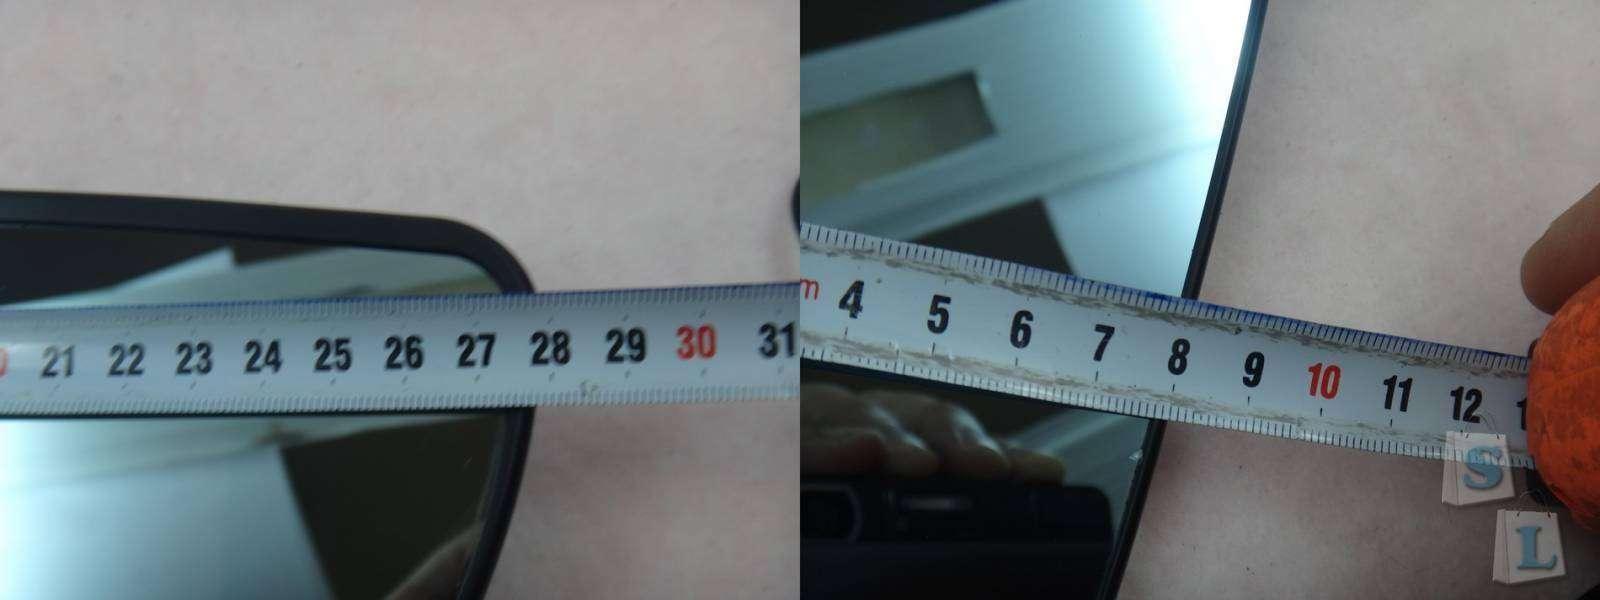 GearBest: Автомобильное зеркало Shadow GL8000 с 3.0' дисплеем и FullHD регистратором и GPS трекером